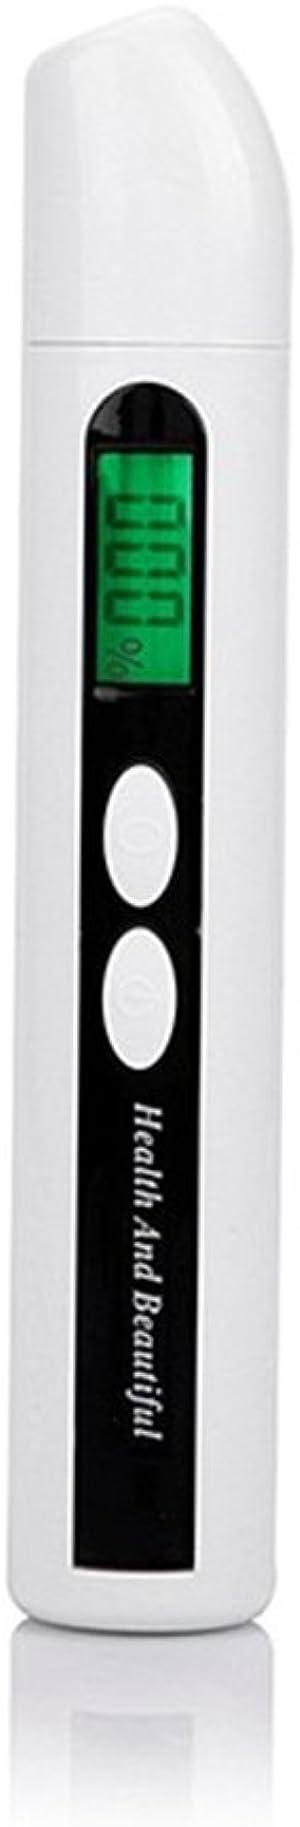 Zinnor Portable Skin Facial Moisture Analyzer Digital Monitor Tester Face Skin Sensor Tester Oil Detector Skin Care Tool